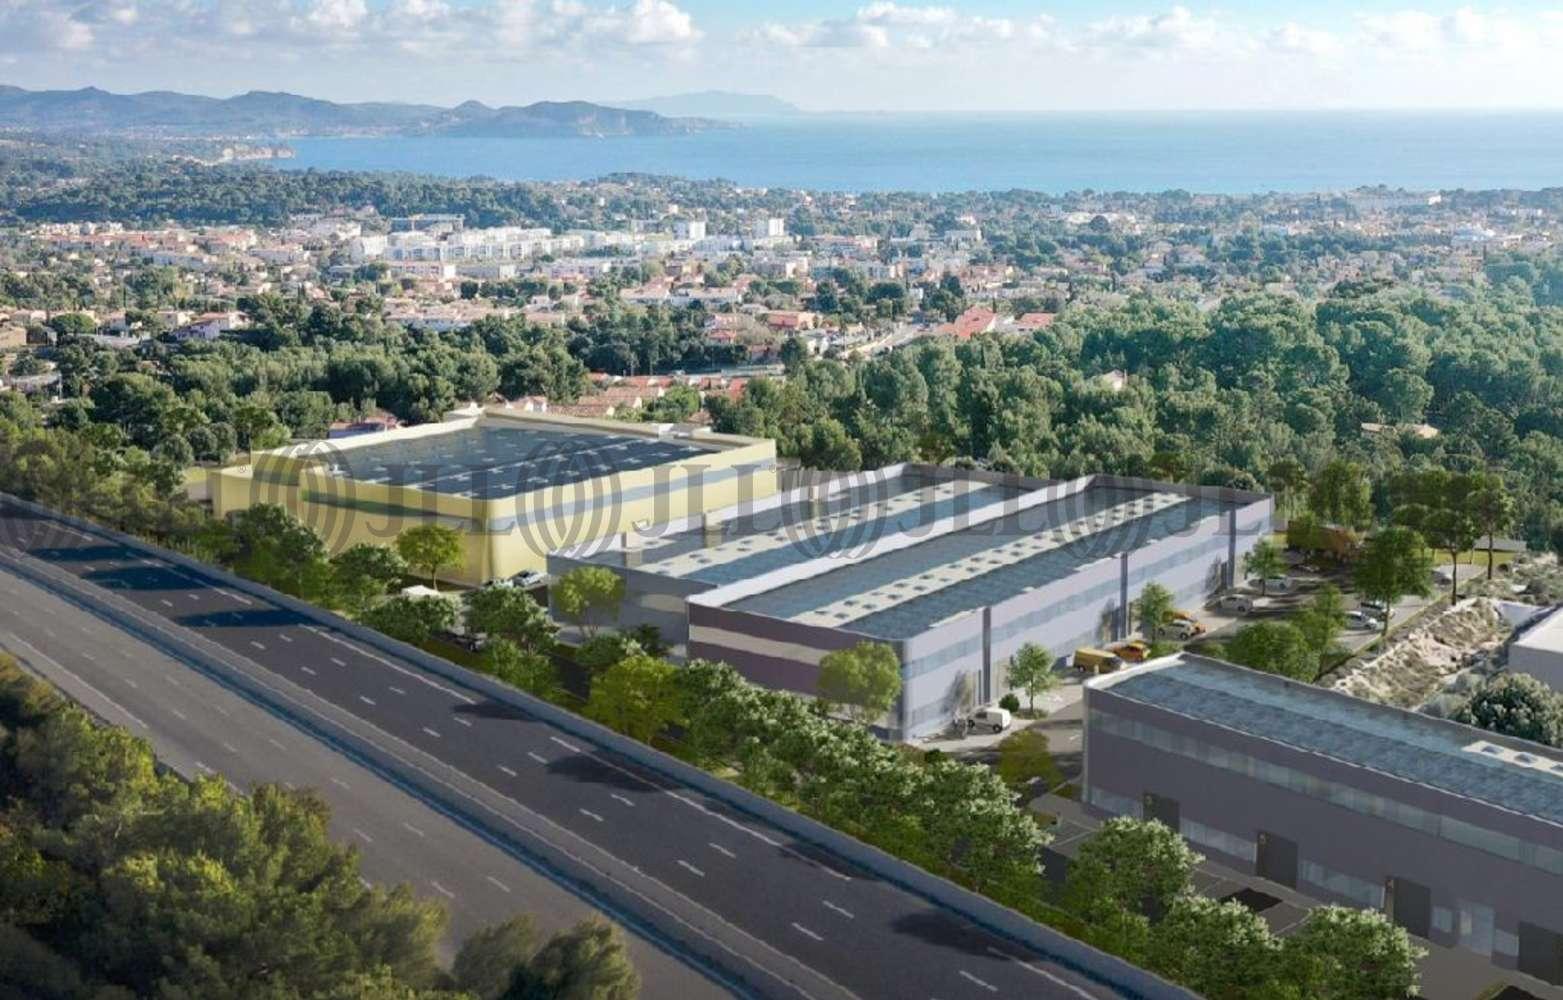 Activités/entrepôt La ciotat, 13600 - PARC CENTRAL - BATIMENT A